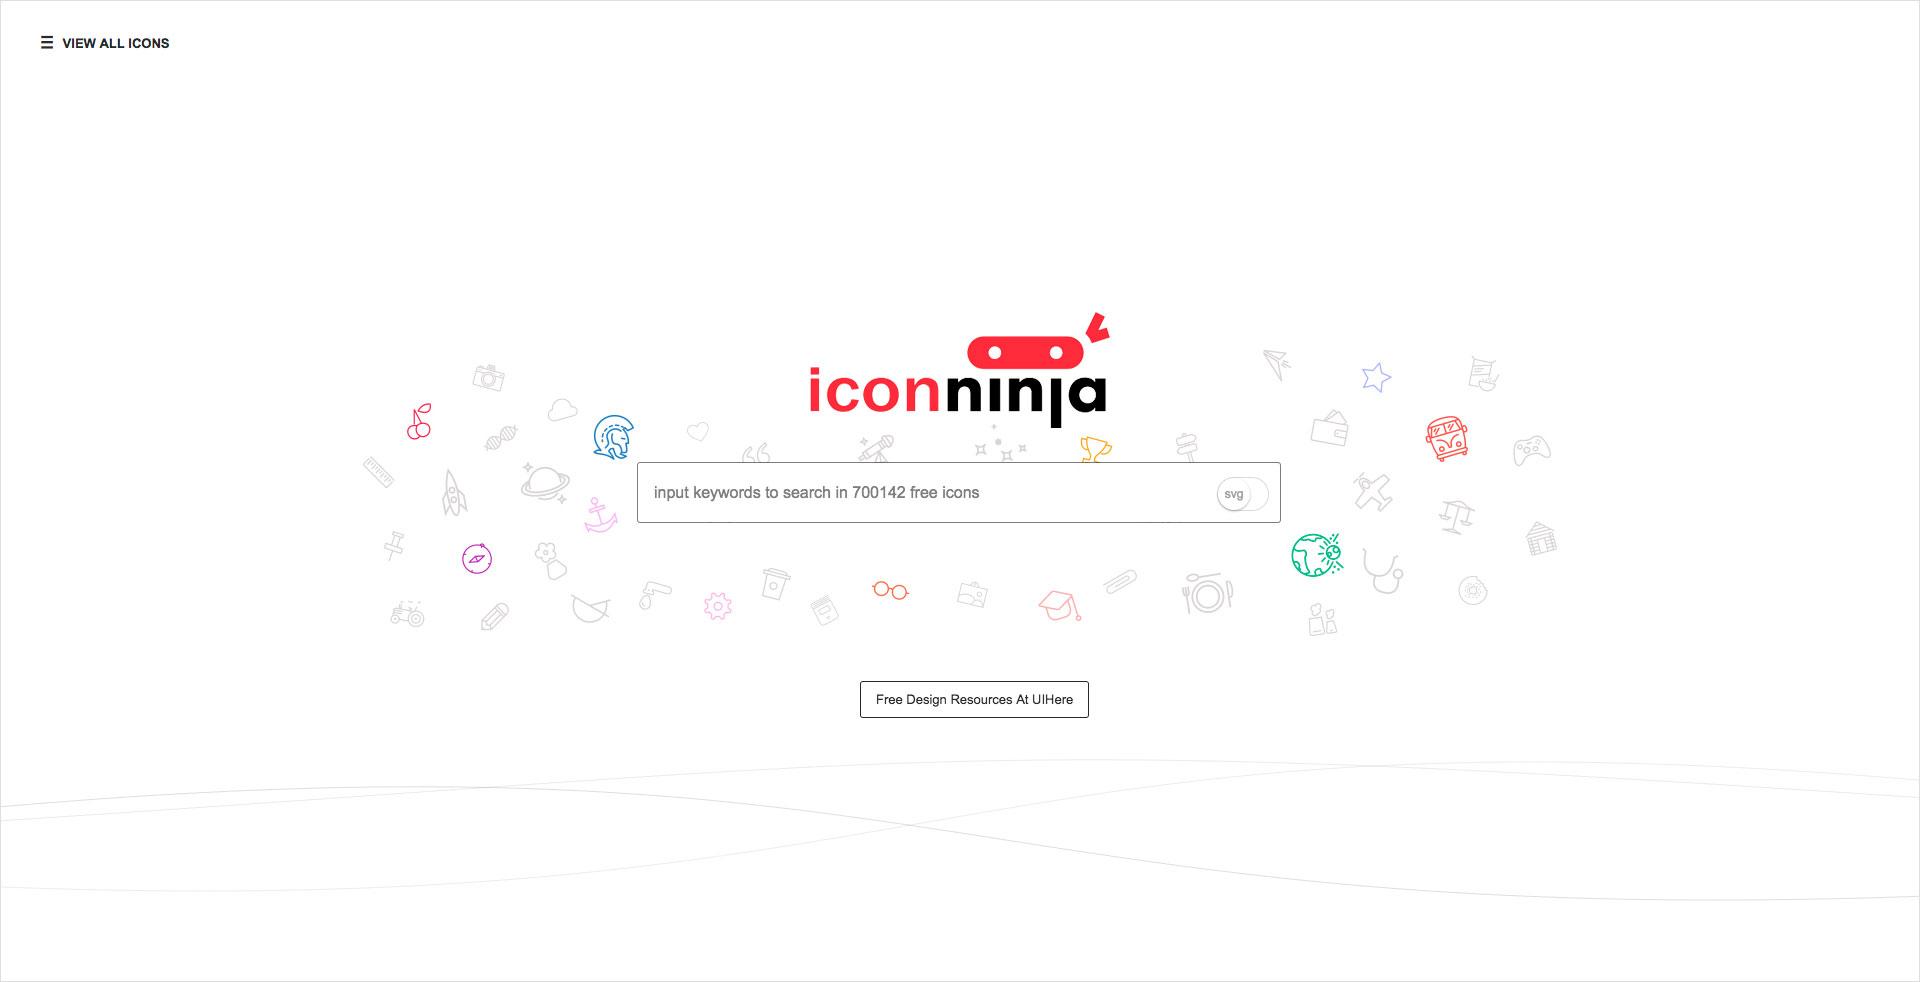 iconninja